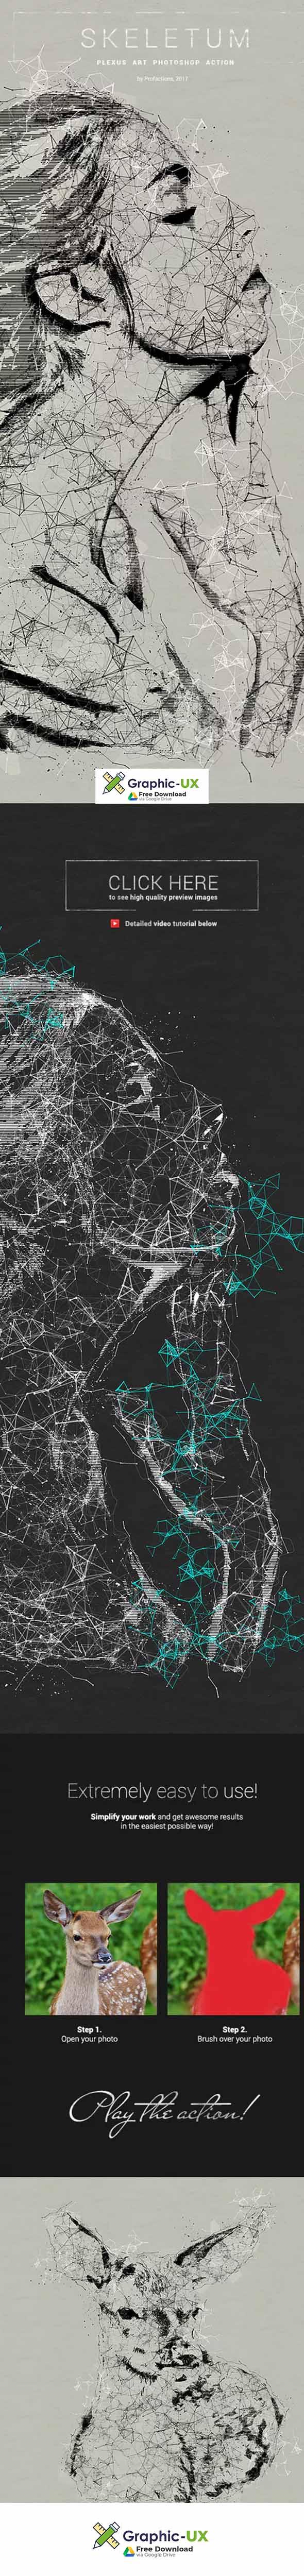 Skeletum - Plexus Art Photoshop Action free download – GraphicUX